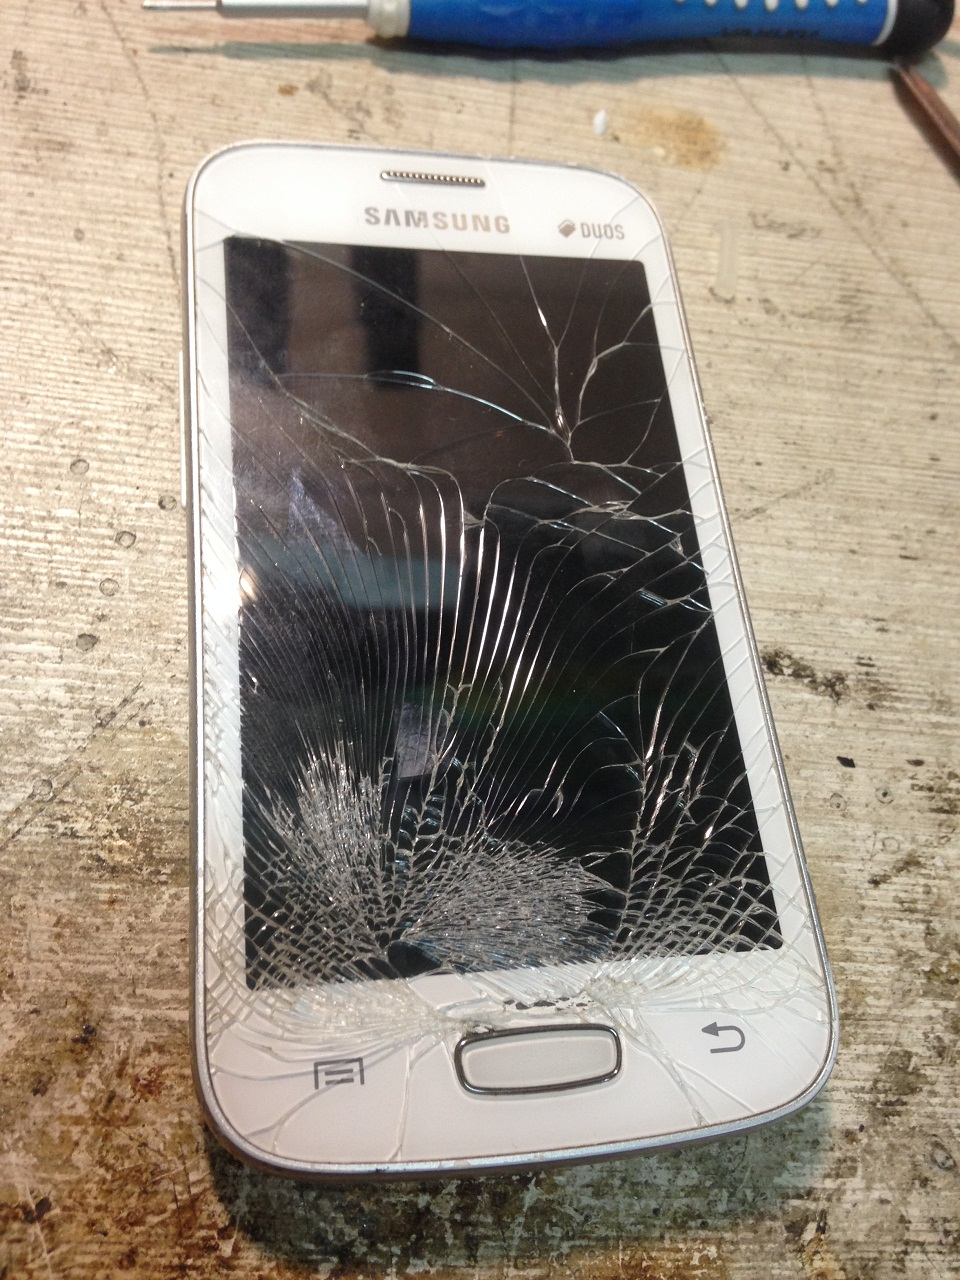 экрана руками сенсорного телефоне самсунг своими замена на